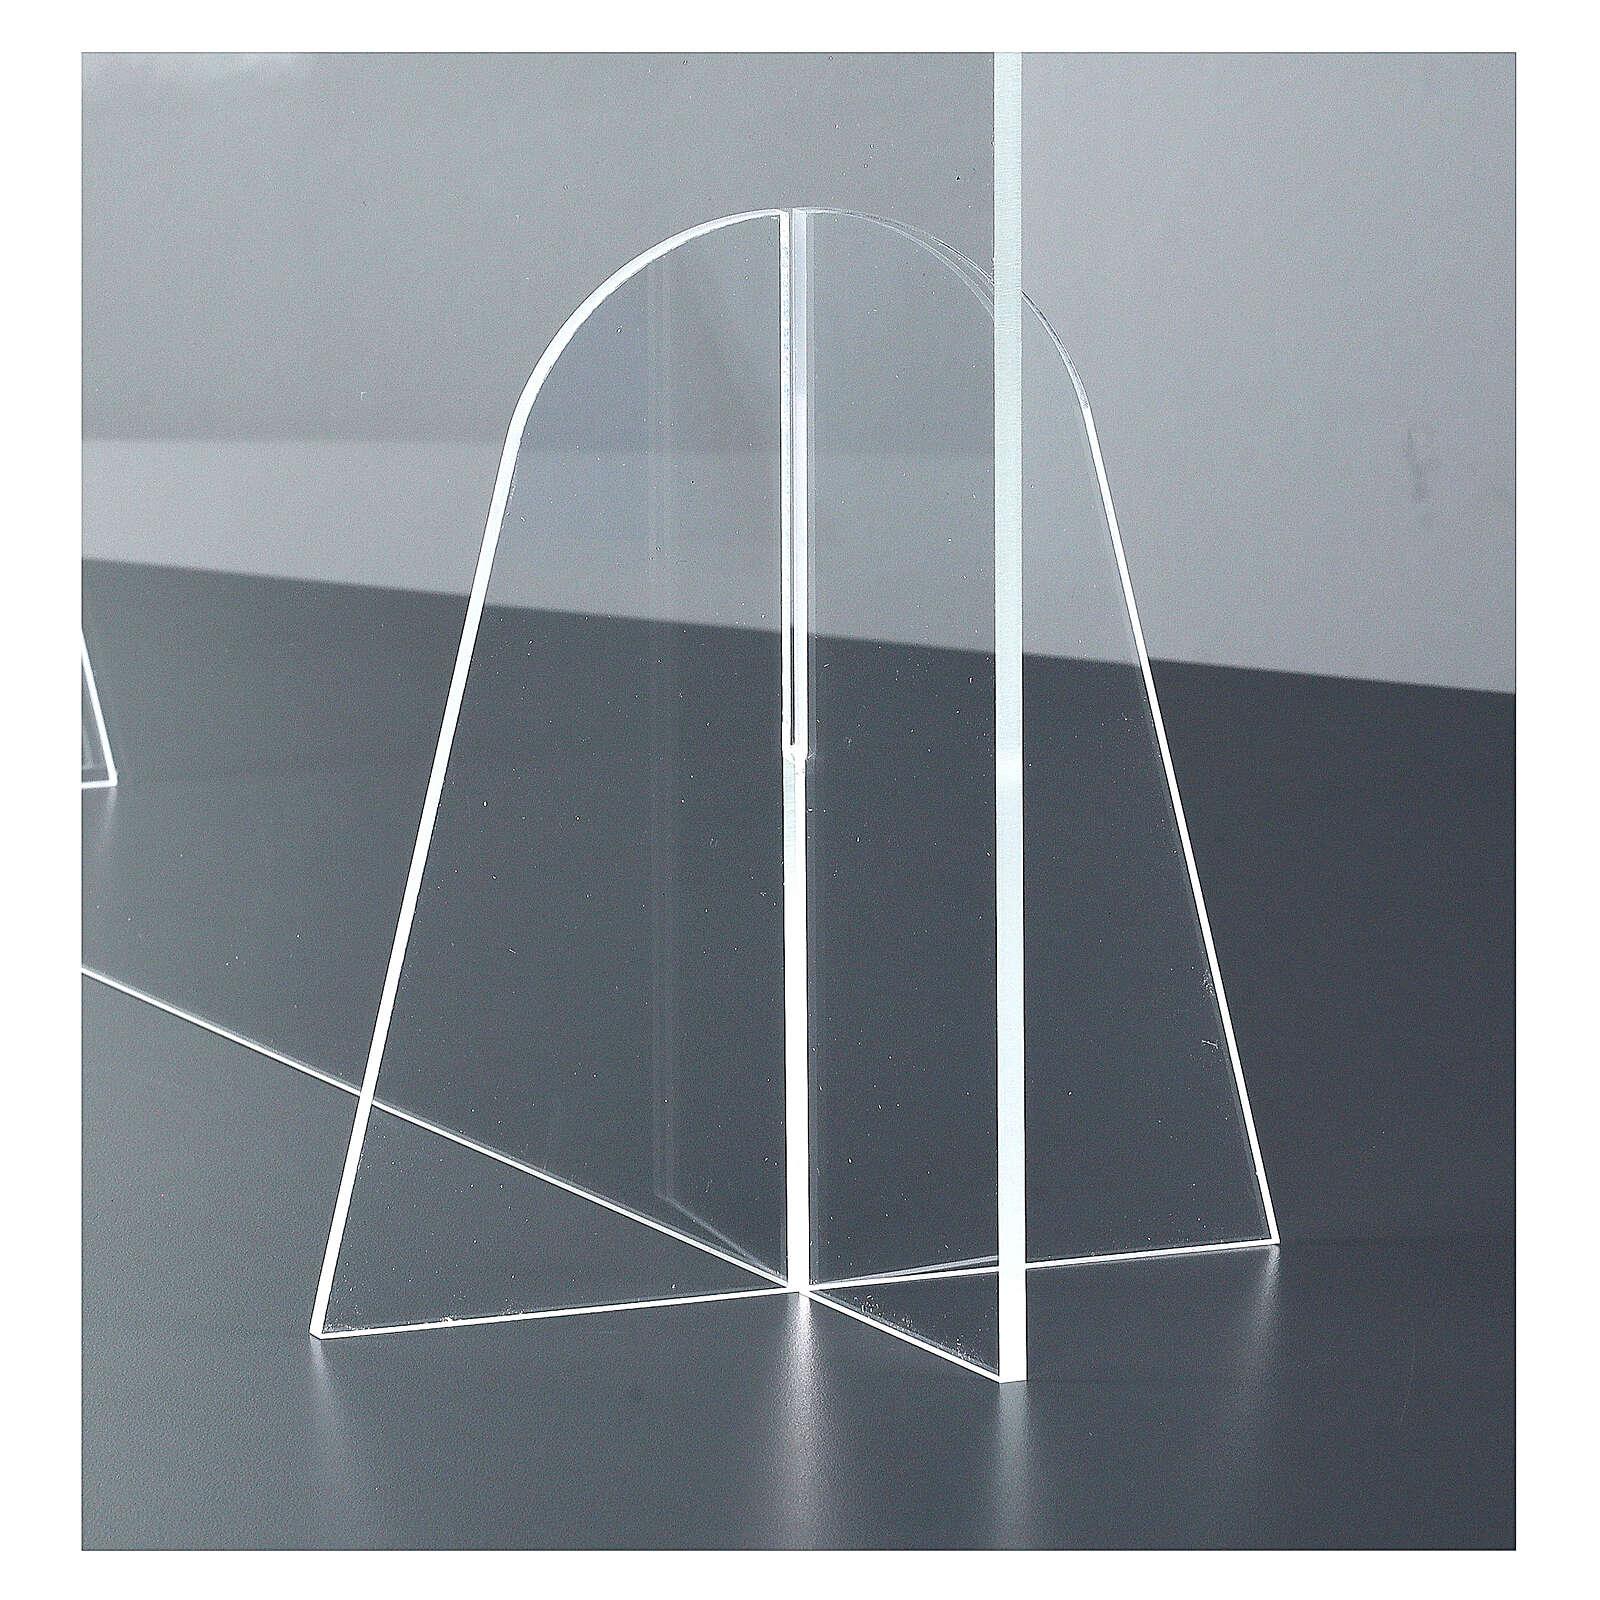 Ekran ochronny na stół design Goccia pleksiglas h 50x140 3